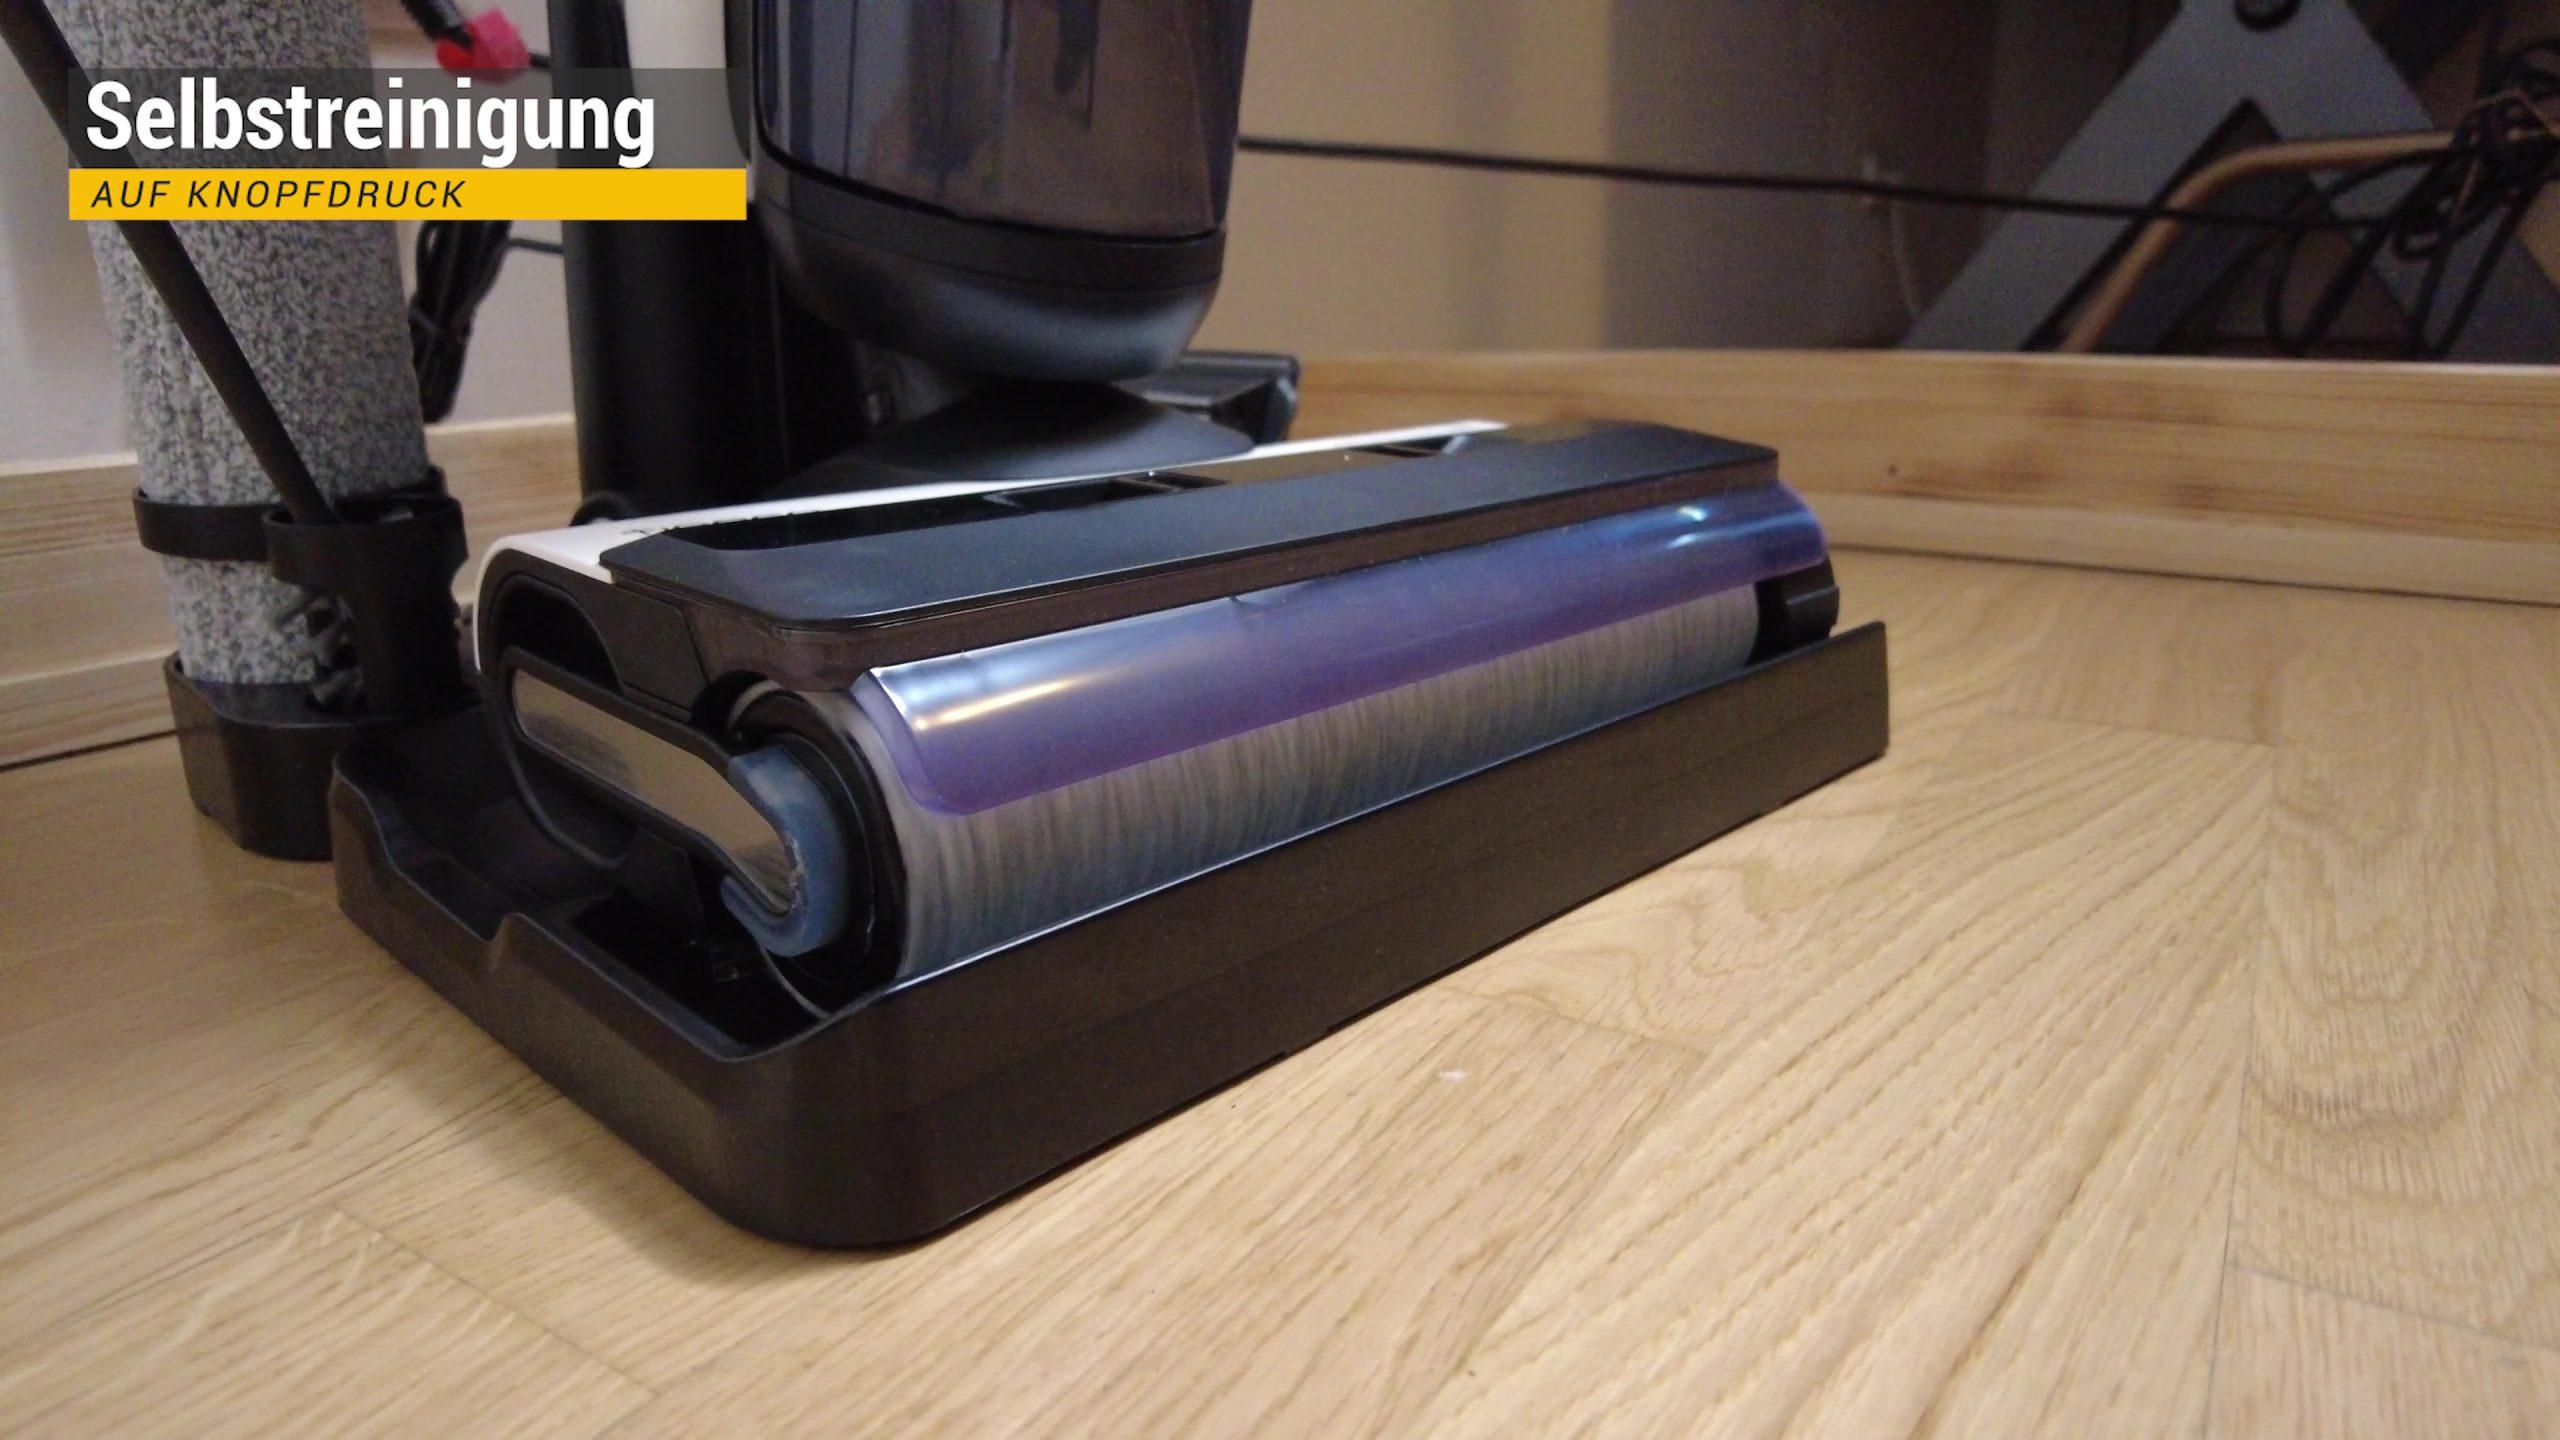 Tineco Floor One S5 Pro Wischsauger Akkusauger Selbstreinigung